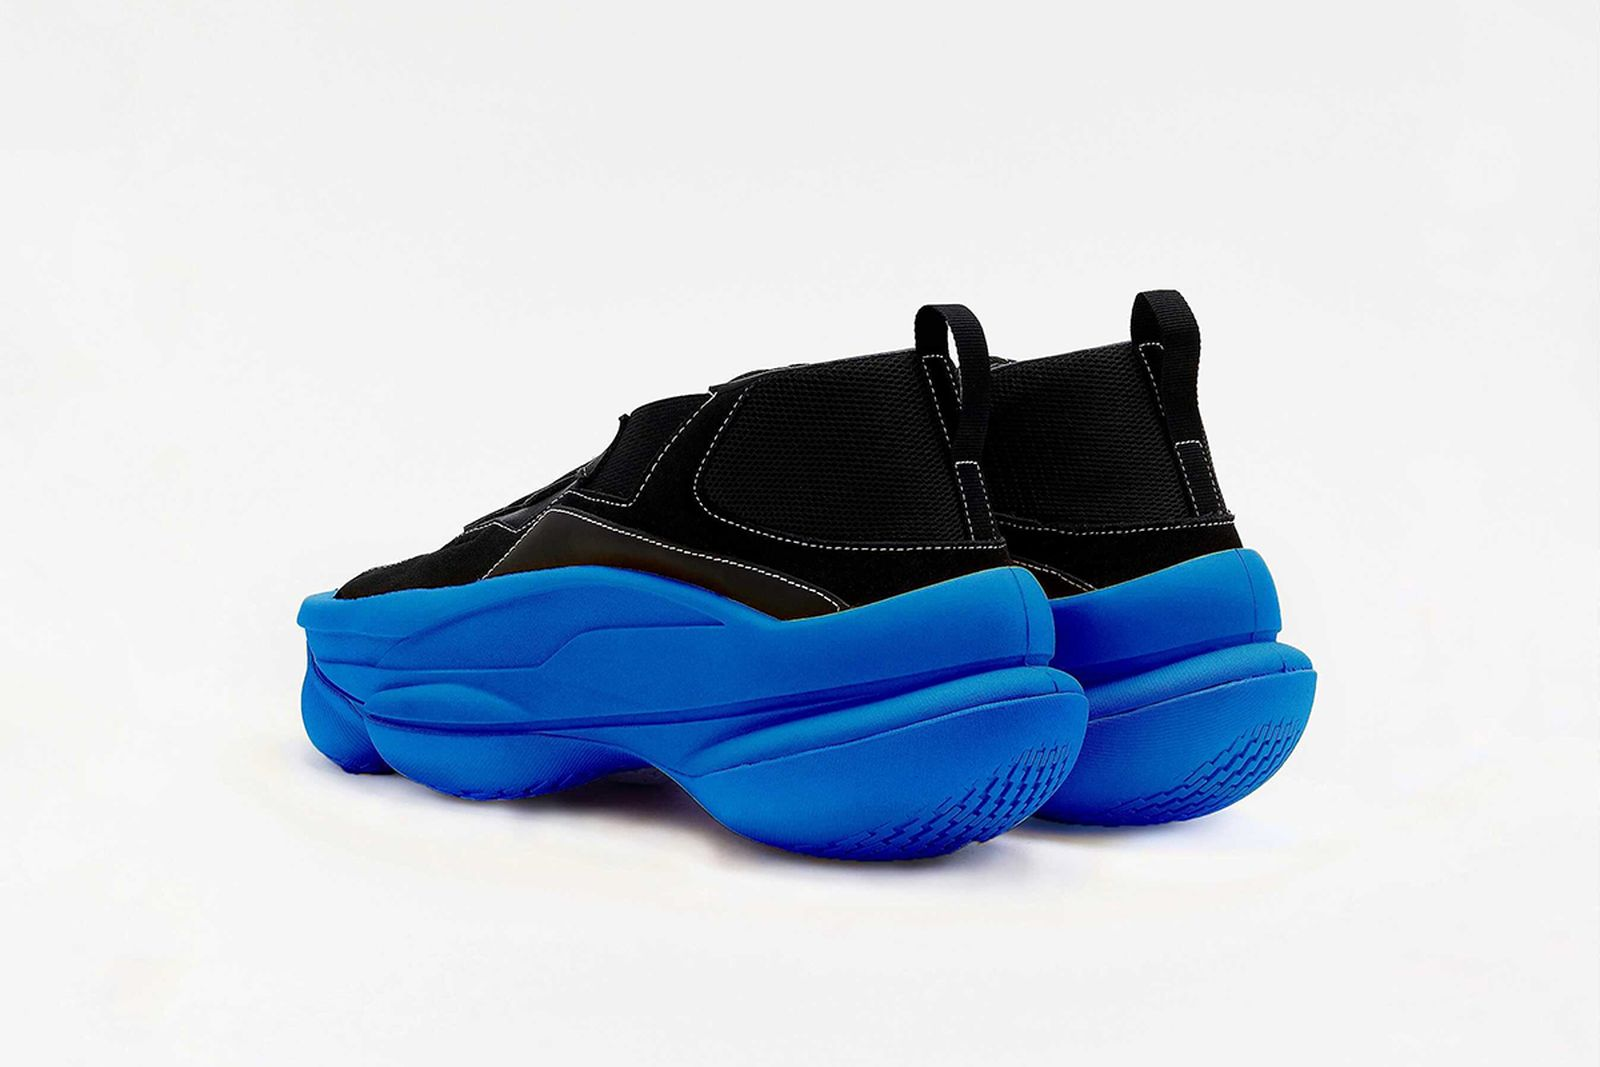 pyer-moss-sculpt-blue-release-date-price-01